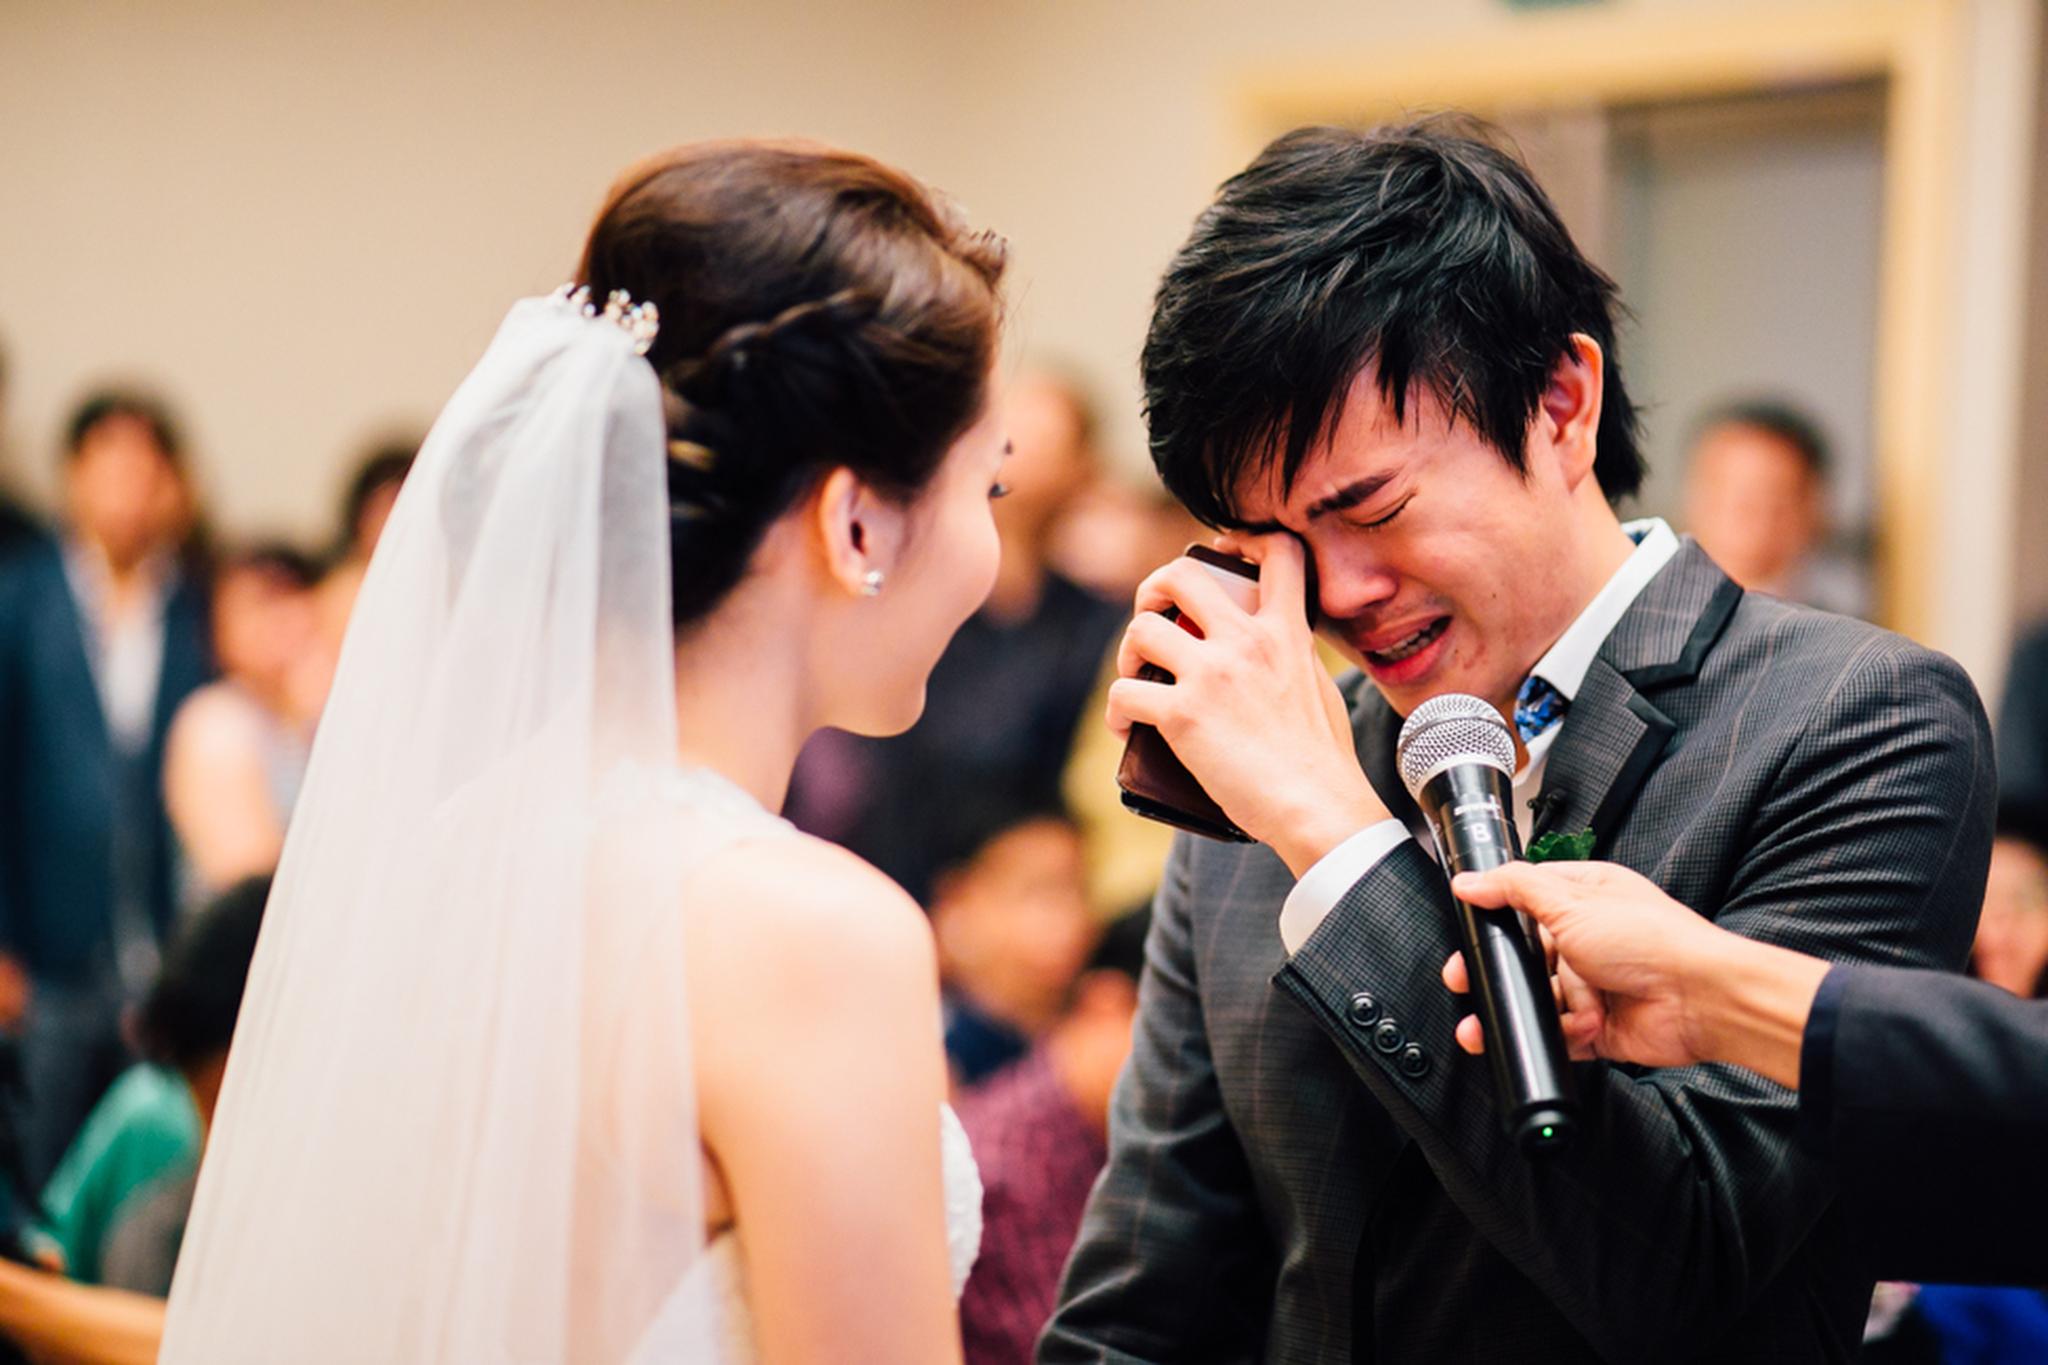 Singapore Wedding Photographer - Joey & Amily Wedding Day (113 of 154).JPG